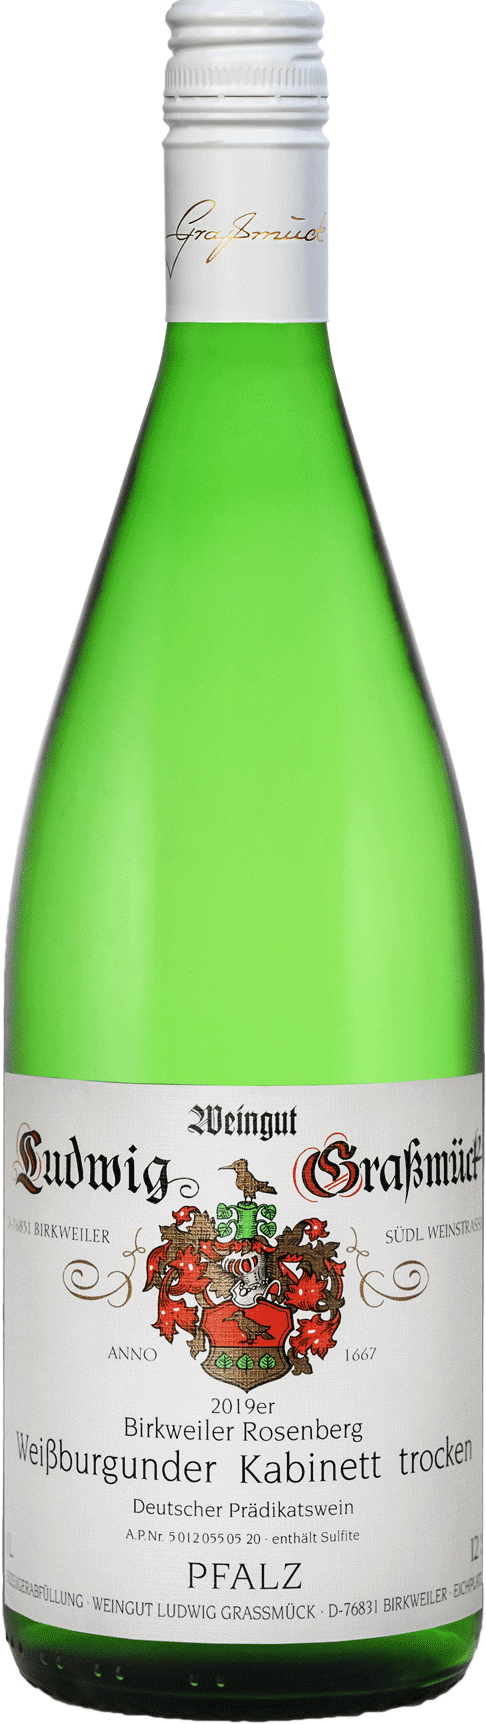 Weingut Ludwig Graßmück, Simon Graßmück, Weissburgunder Kabinett, trocken 2019